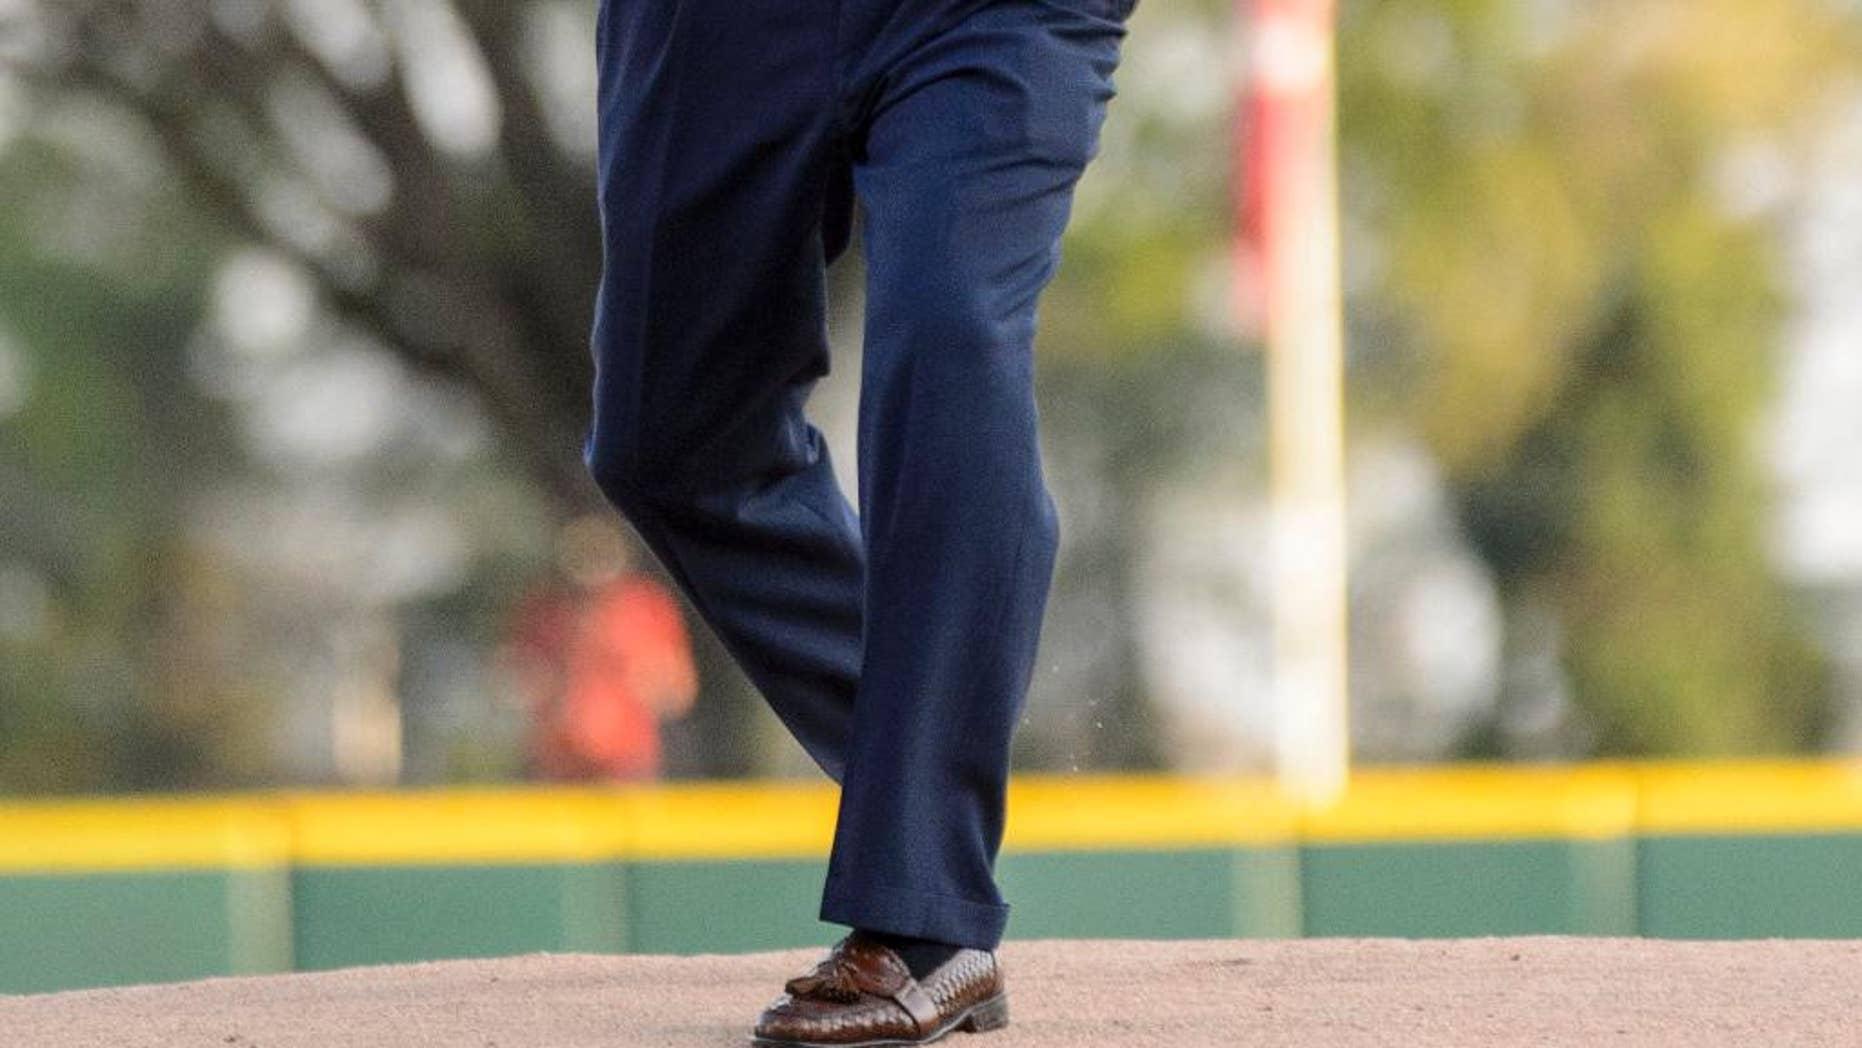 Alabama football coach Nick Saban throws out the ceremonial first pitch at an NCAA college baseball game between Alabama and Auburn, Friday, April 11, 2014, at Sewell-Thomas Stadium in Tuscaloosa, Ala. (AP Photo/Alabama Media Group, Vasha Hunt) MAGAZINES OUT